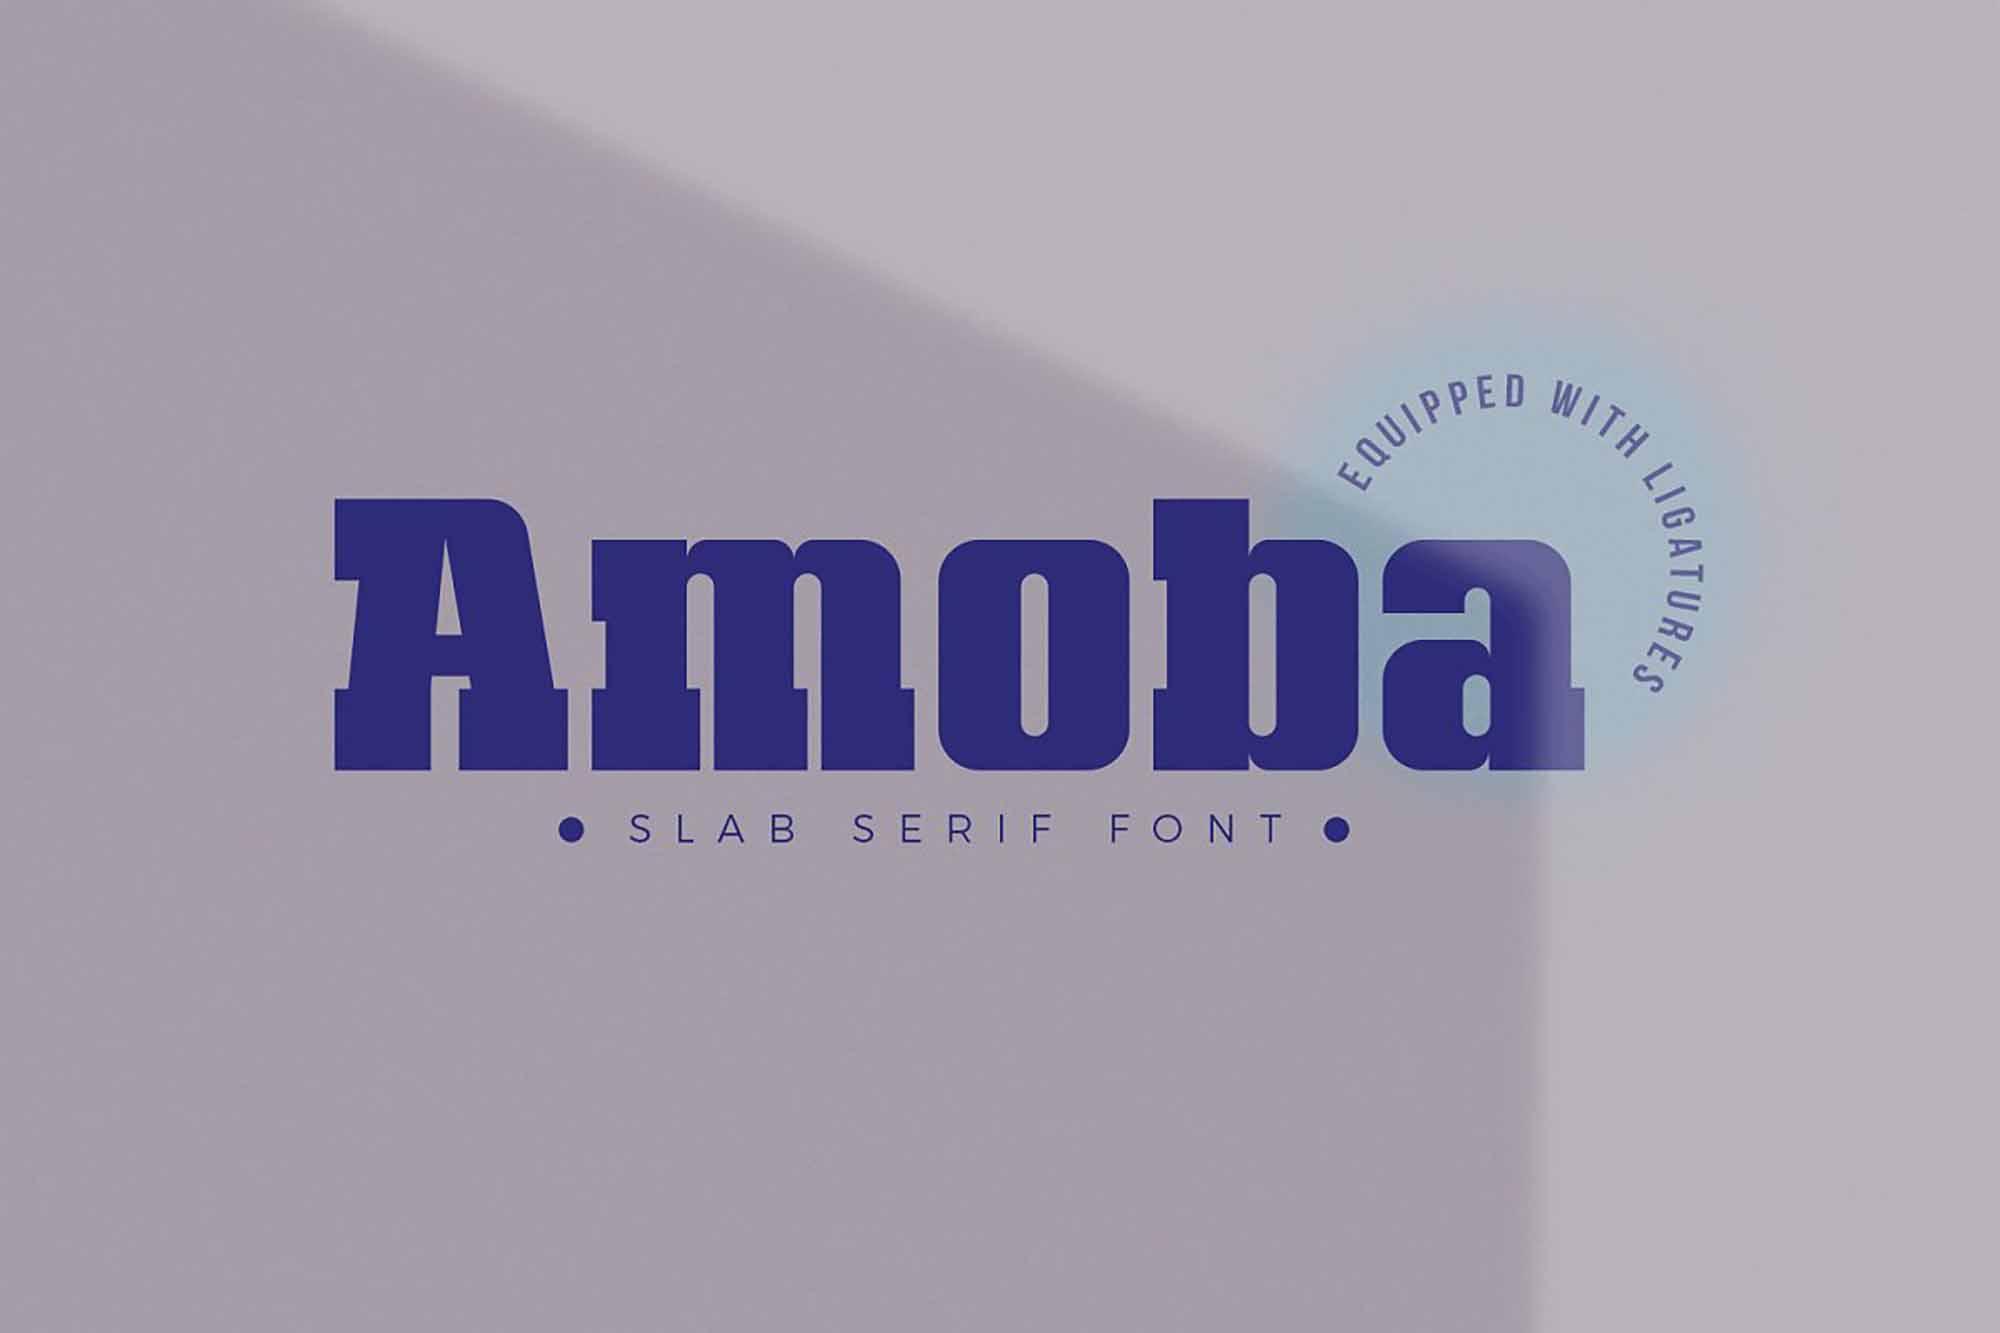 Amoba Slab Serif Font 6